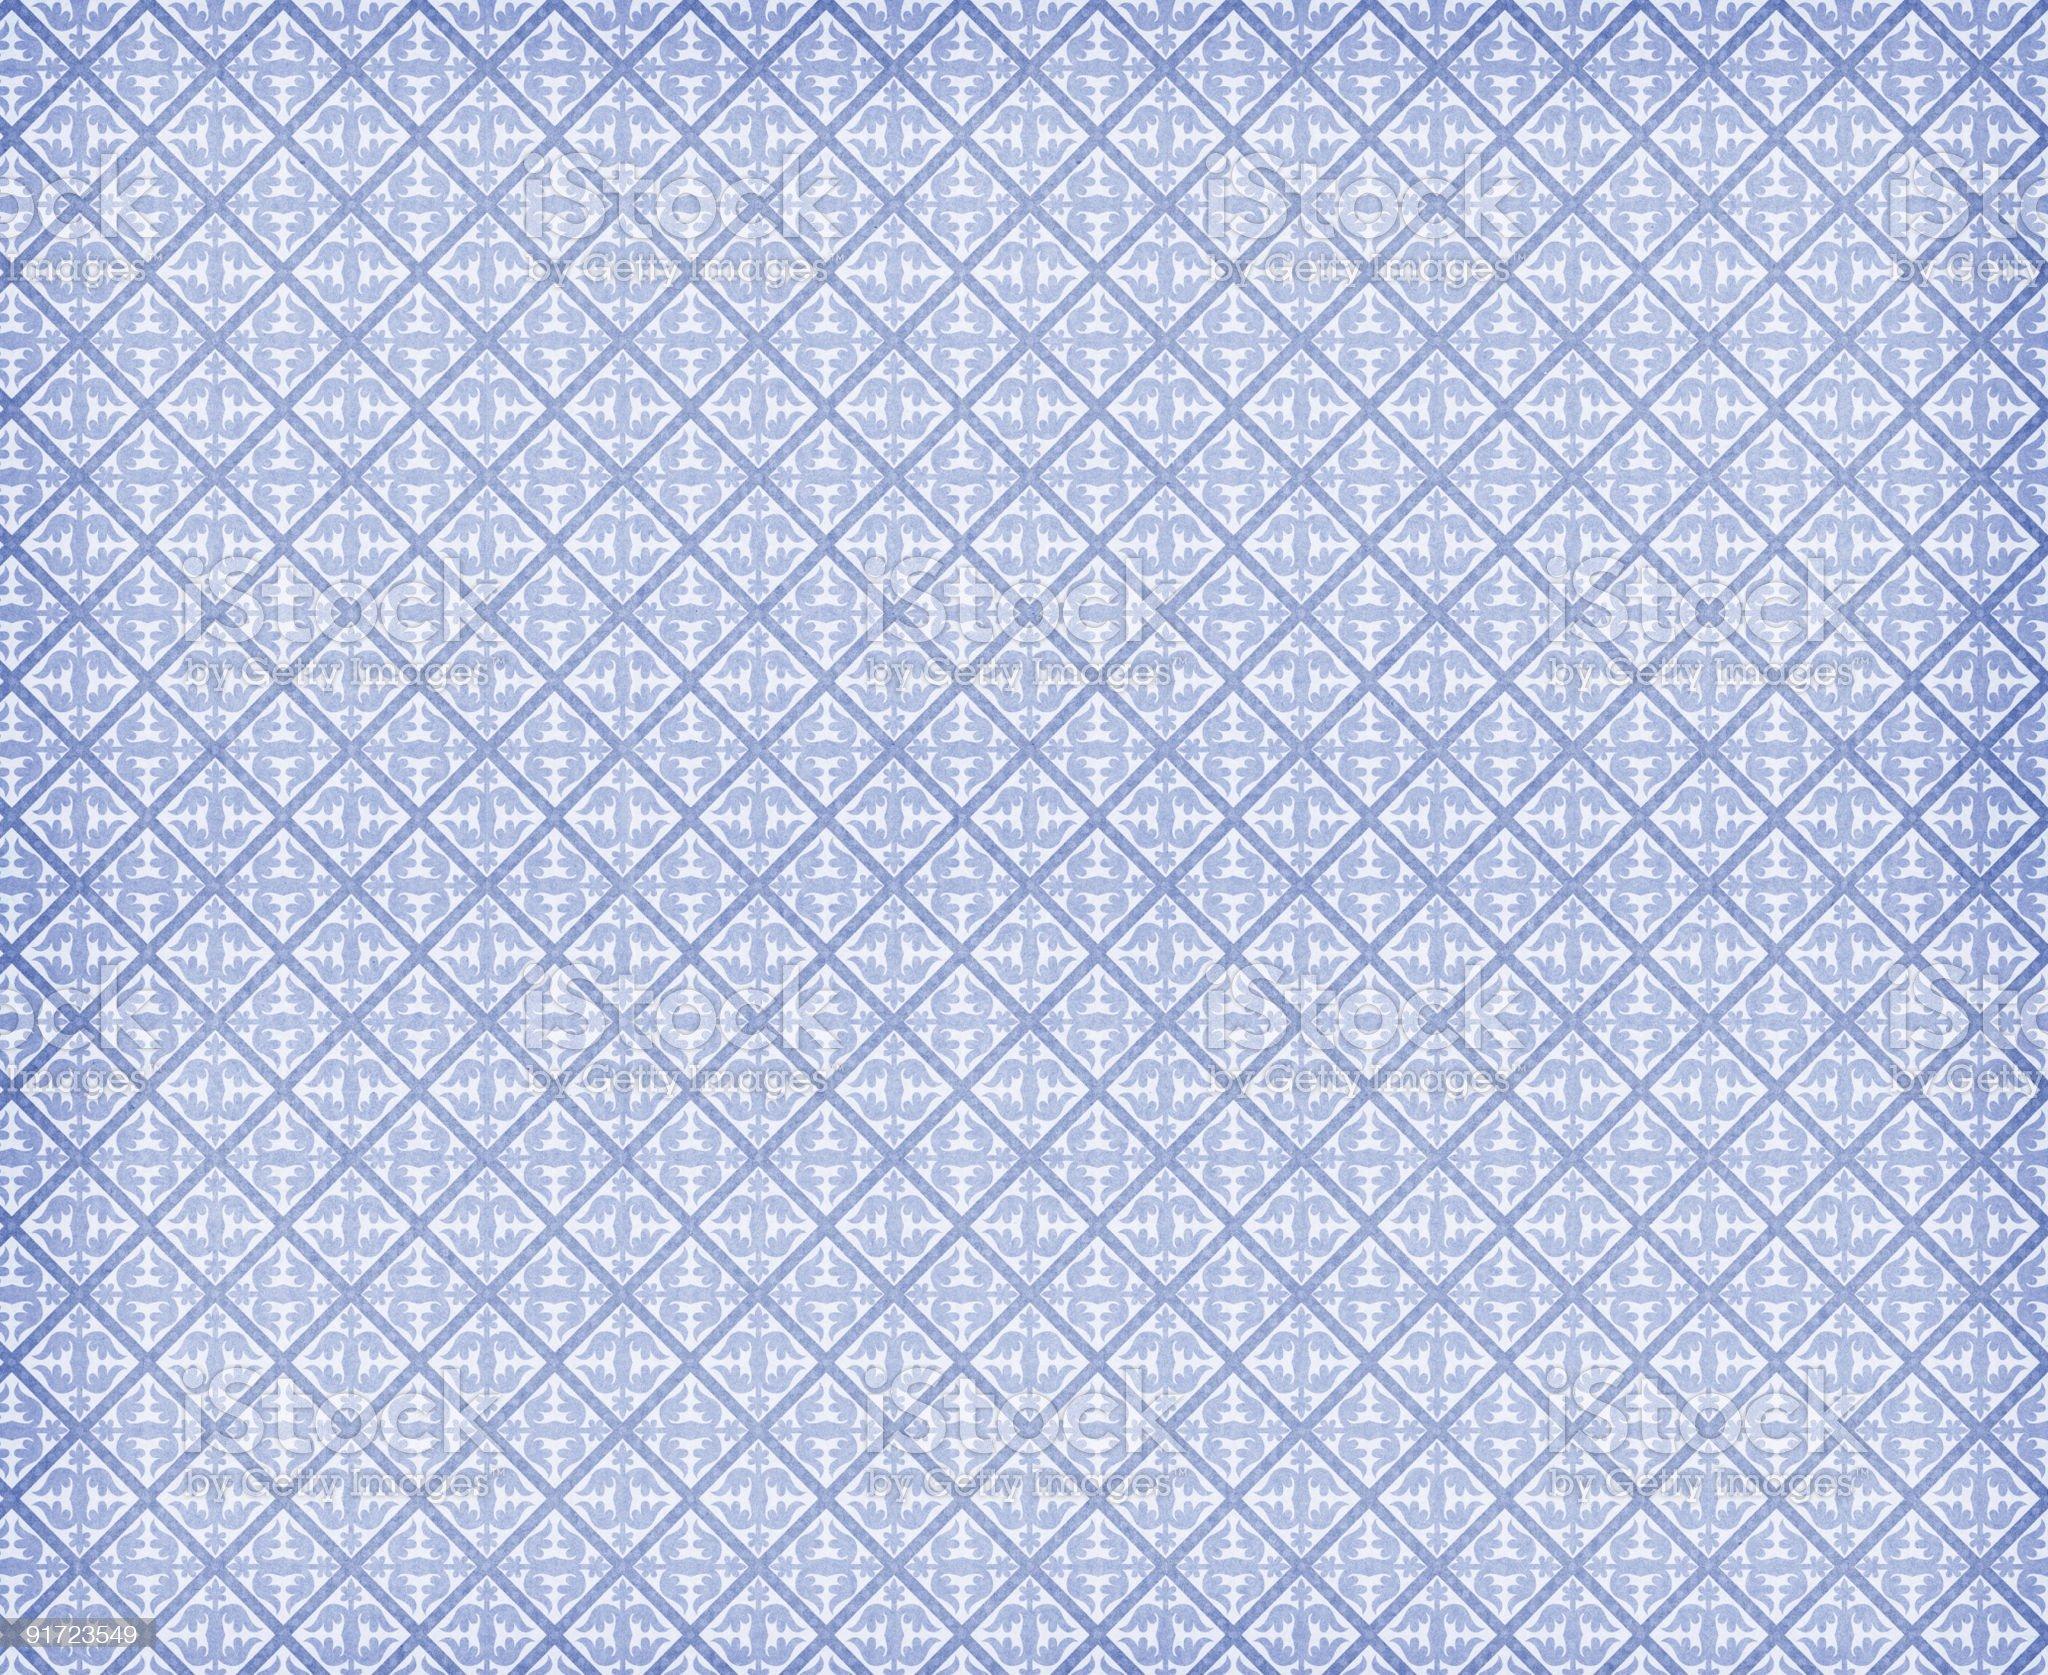 blue wallpaper royalty-free stock vector art